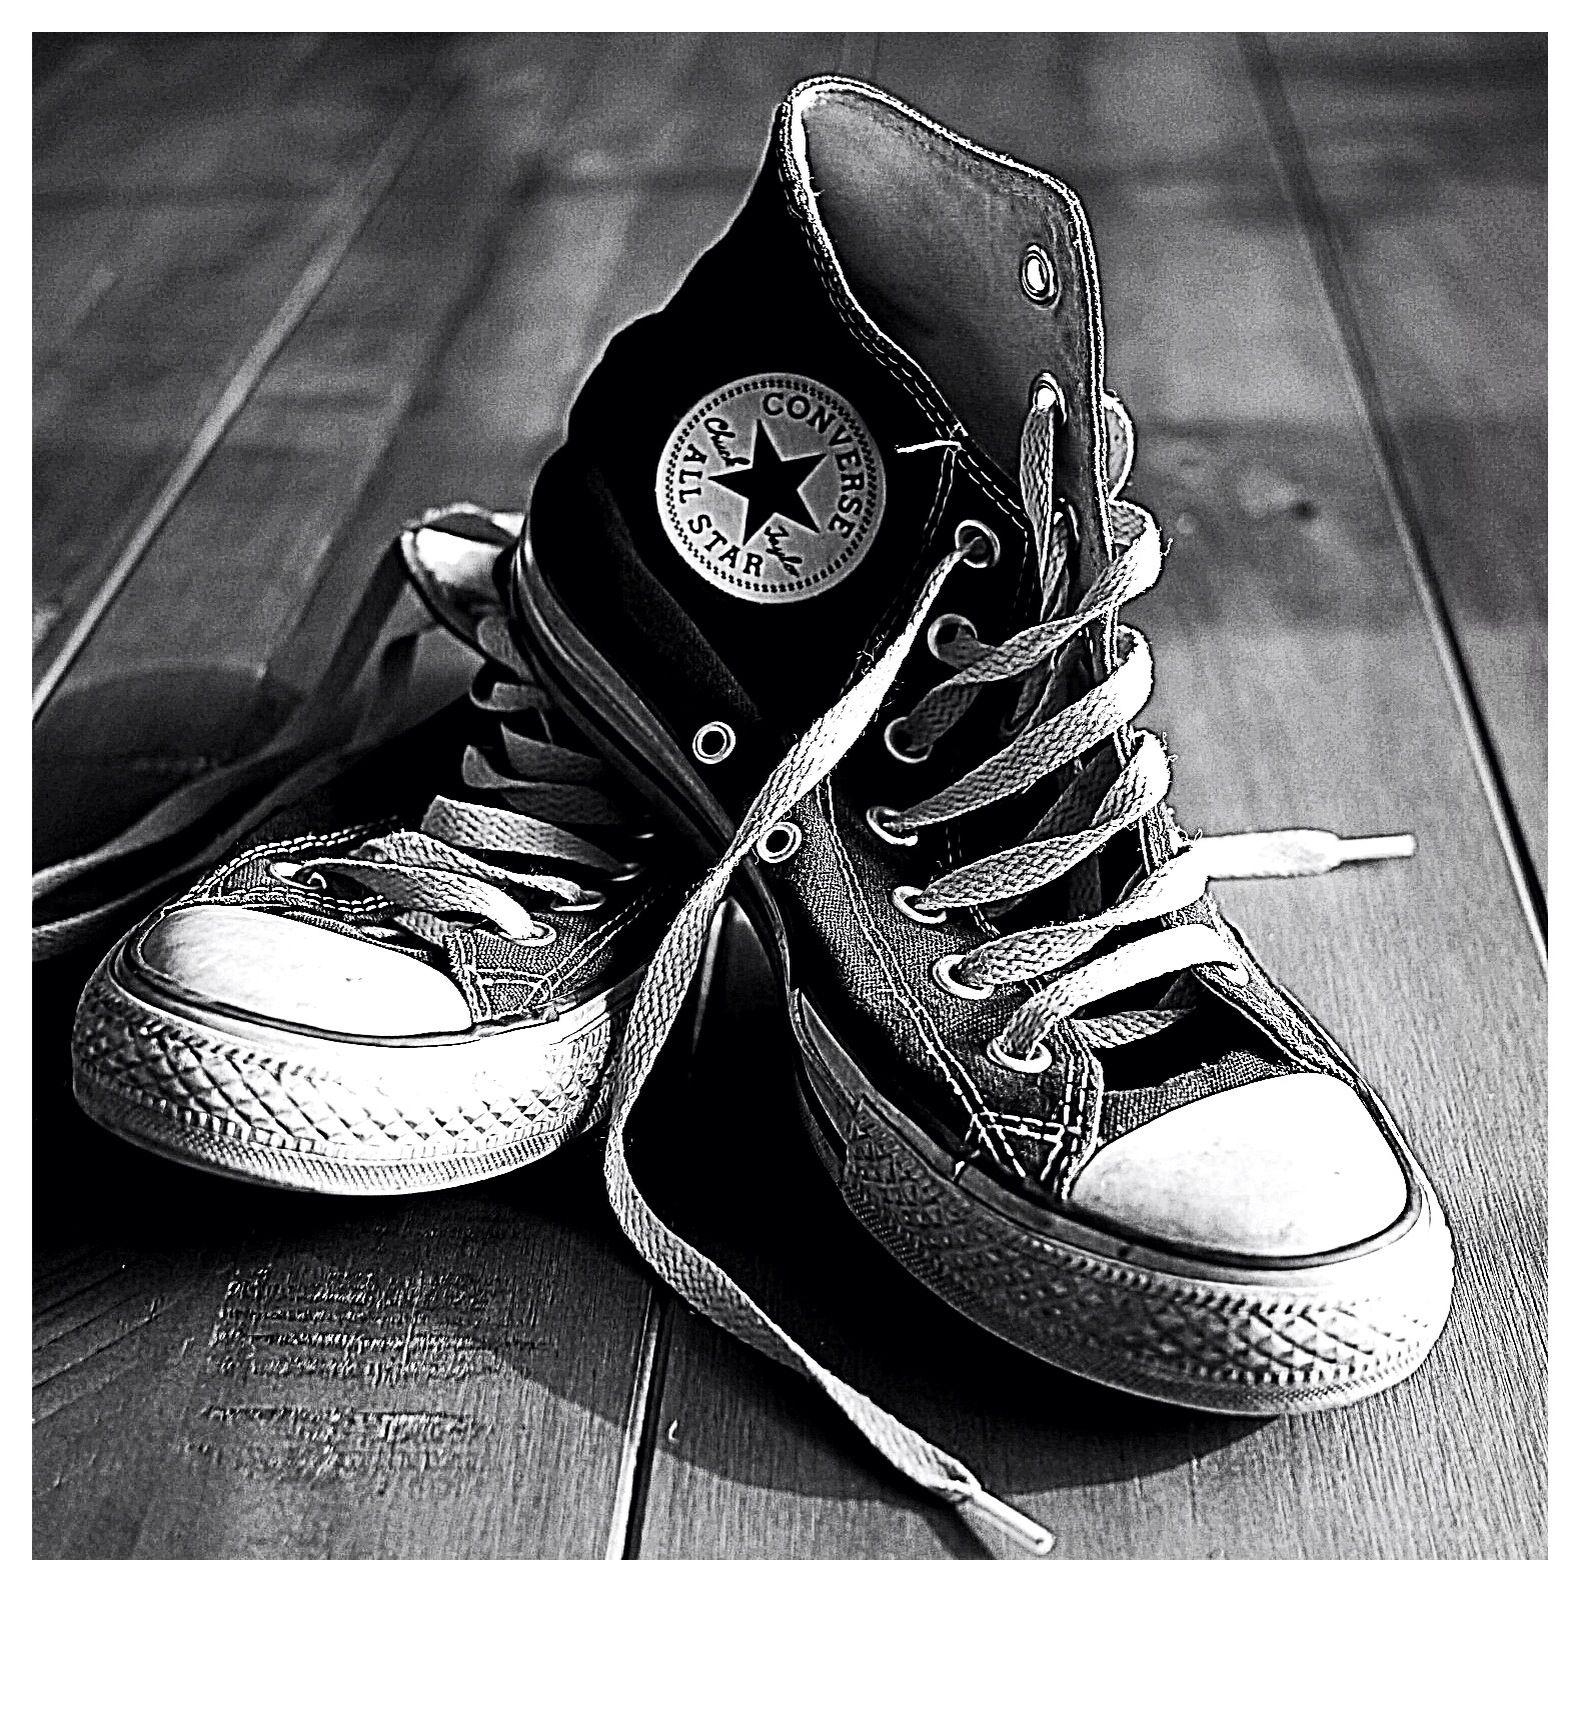 converse black and white. converse black and white